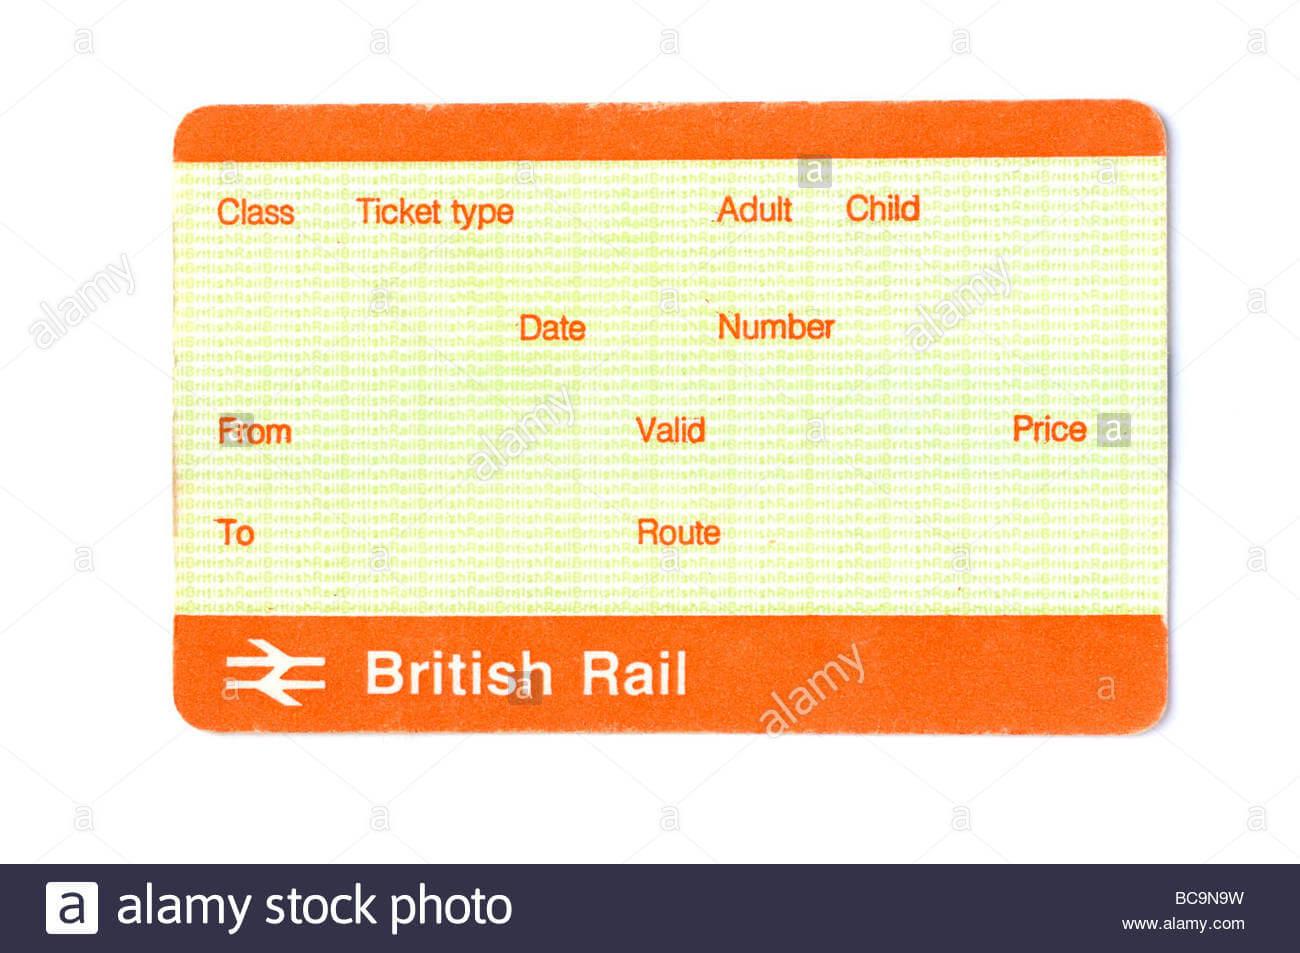 Train Ticket Blank Stock Photos & Train Ticket Blank Stock With Blank Train Ticket Template